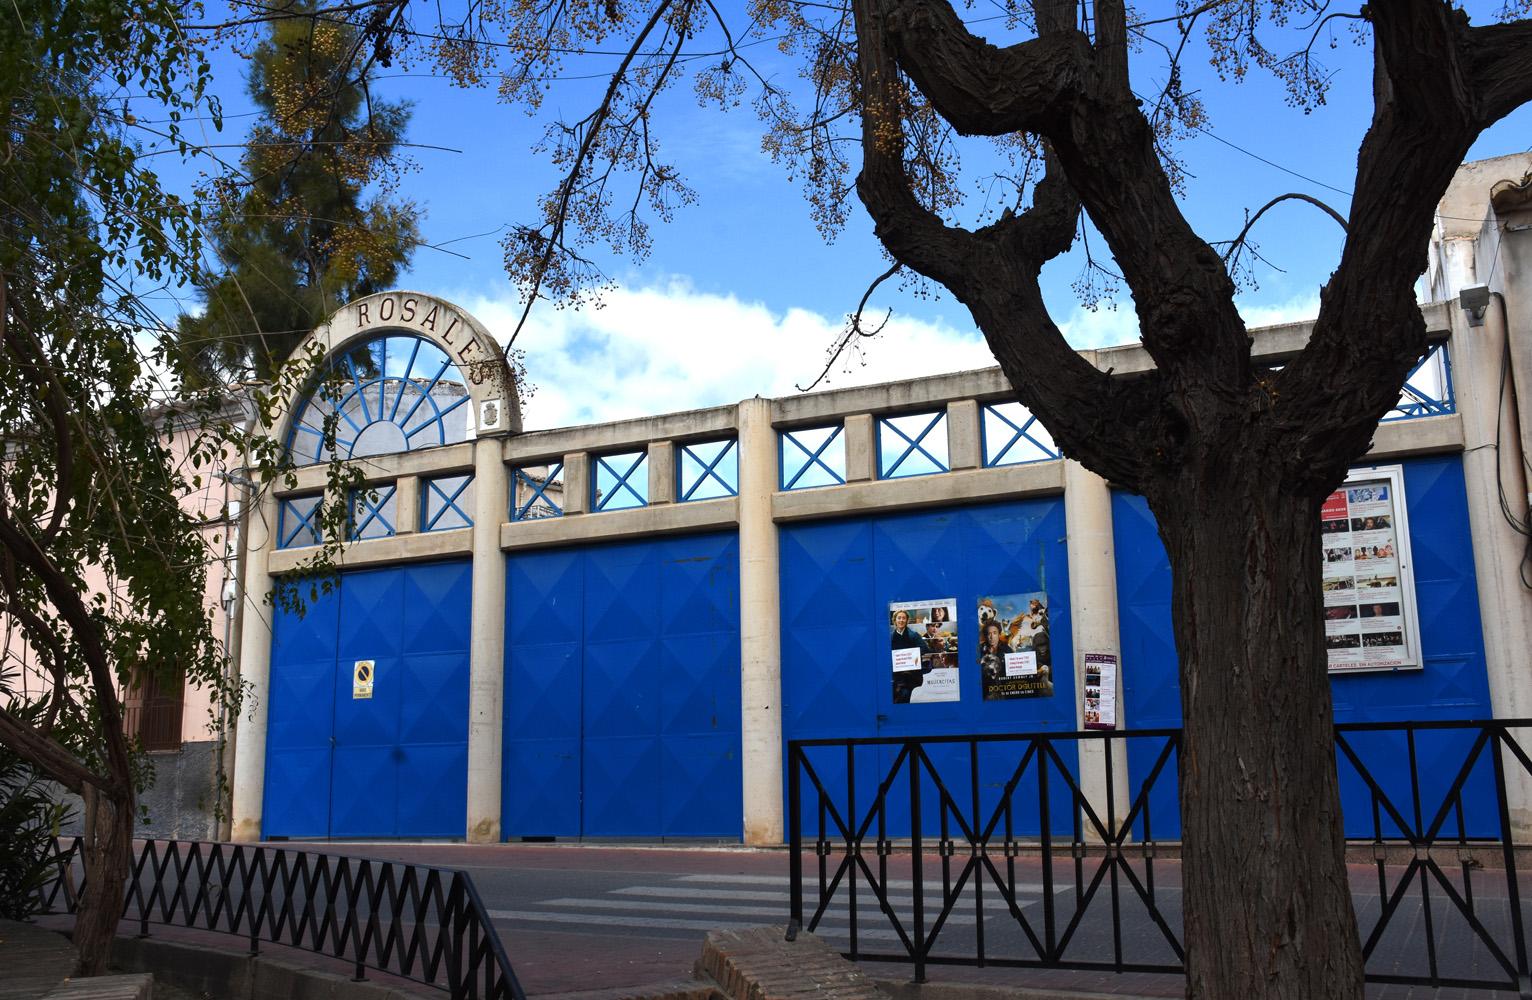 Auditorio Cine Rosales